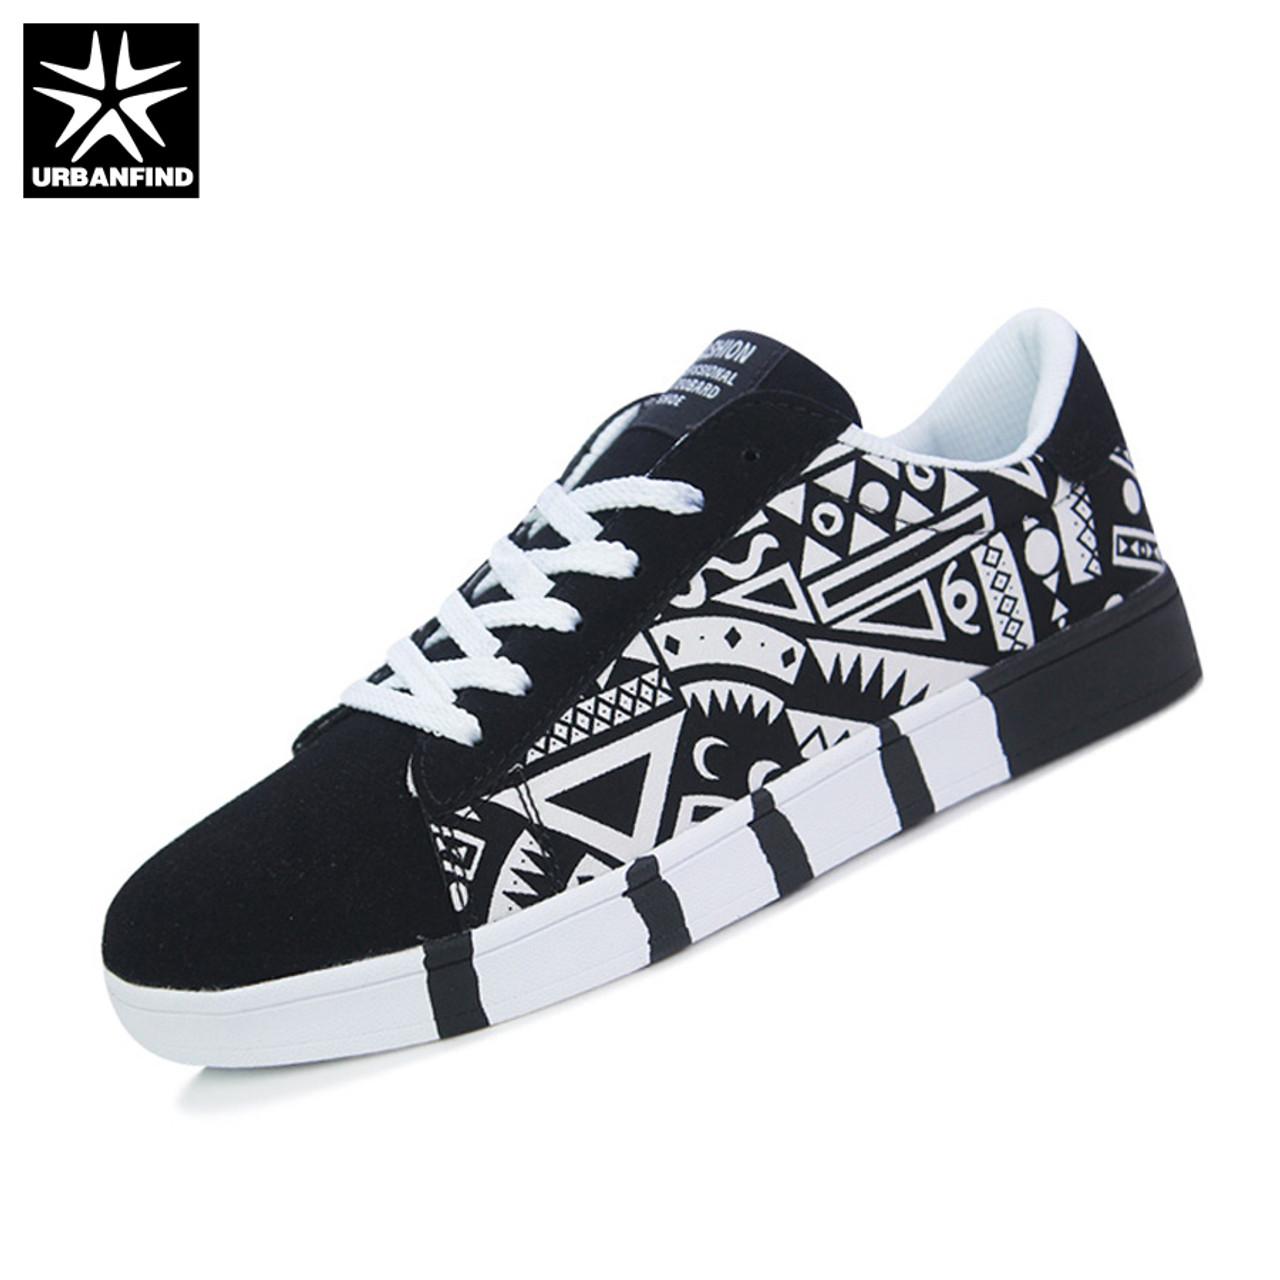 super popular c336c add2c URBANFIND Men Fashion Shoes Man Sneaker Size 39-44 Boy Casual Print Shoes  Men Canvas Breathable Lace Up Style Trend Footwear